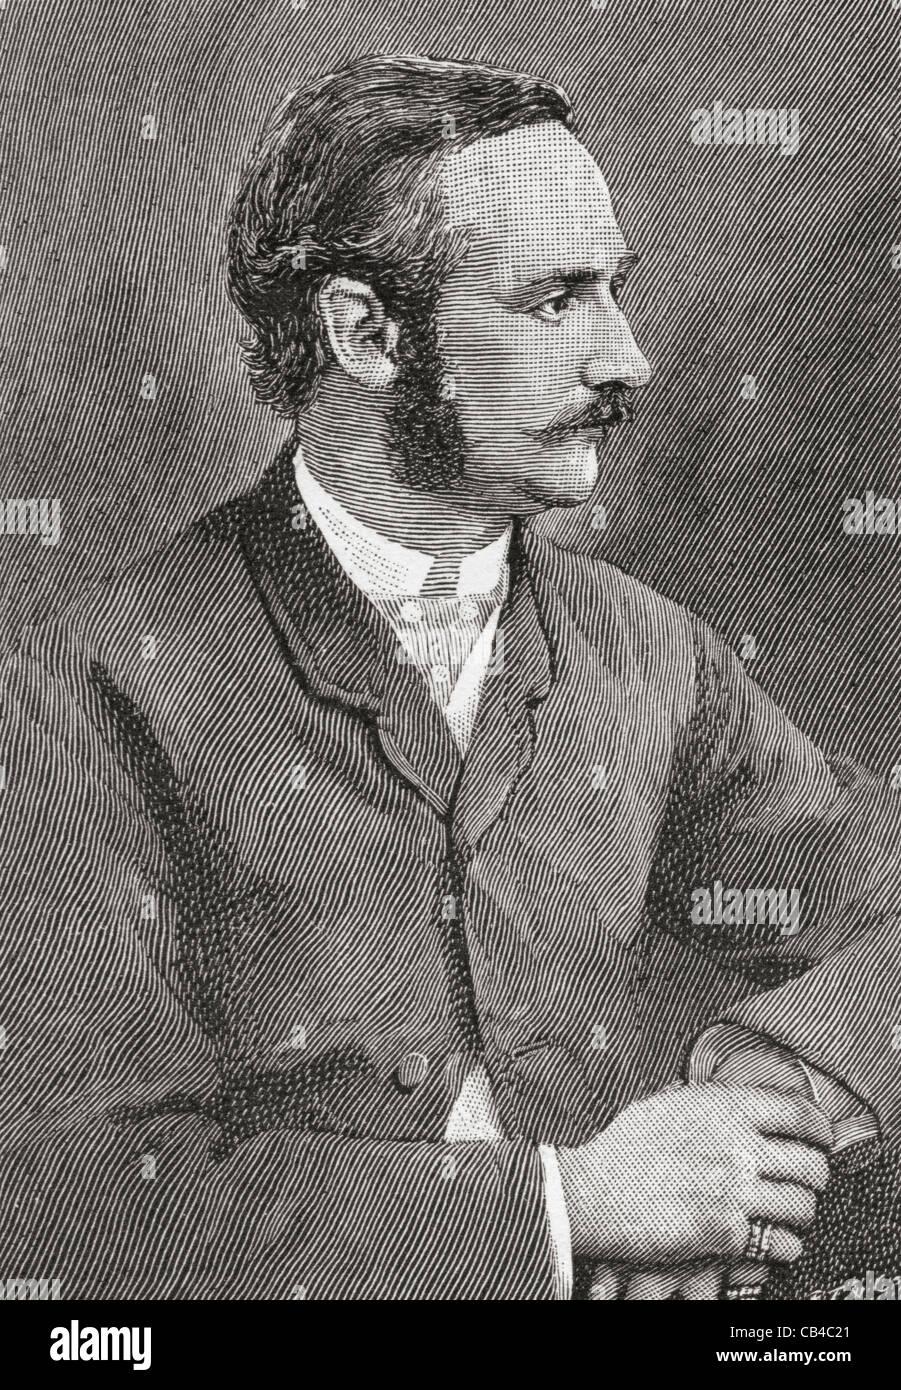 Frederick VIII, aged 30, 1843 – 1912. King of Denmark. Stock Photo